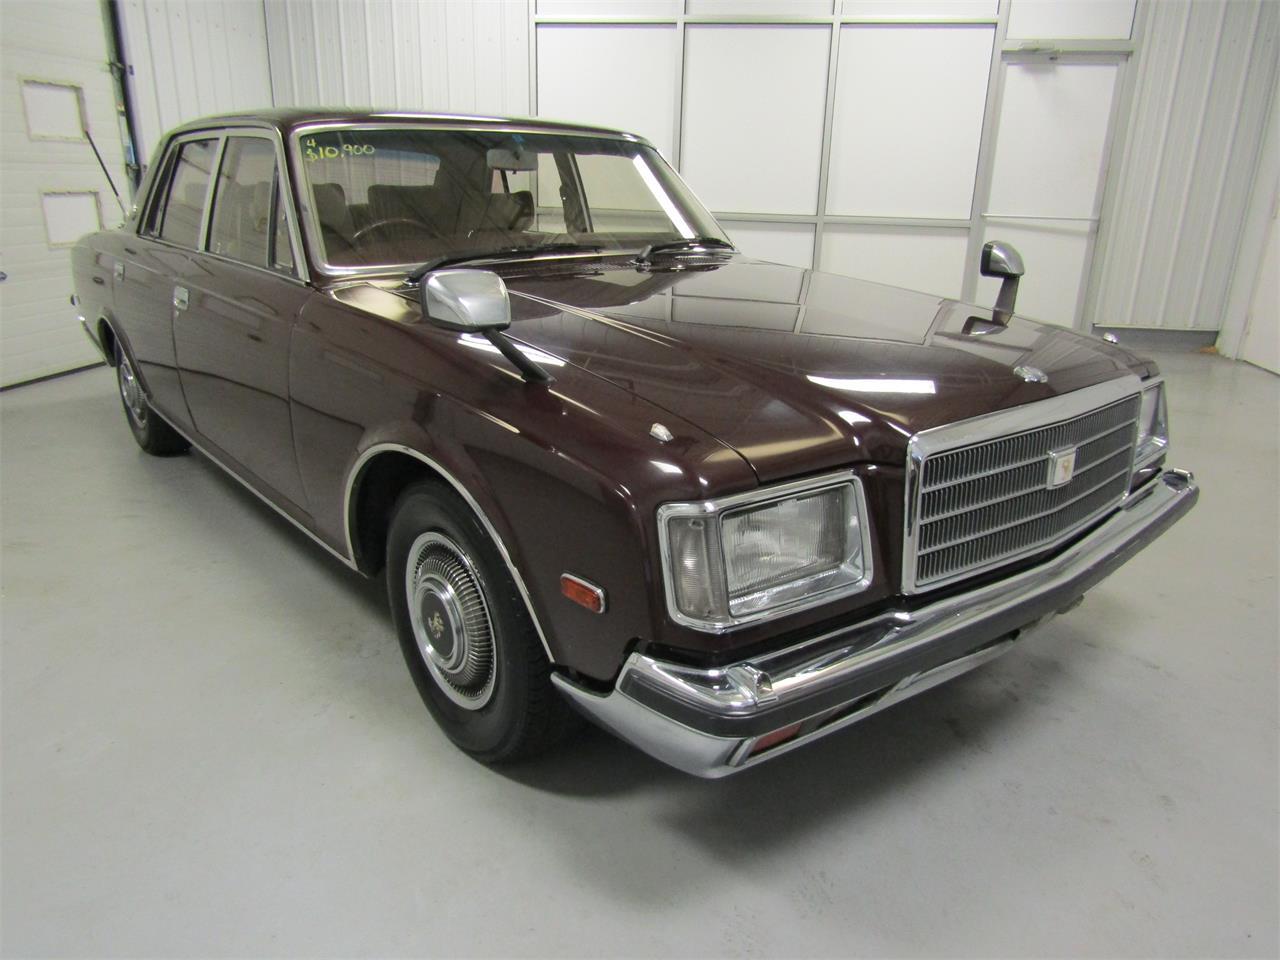 1984 Toyota Century (CC-1110964) for sale in Christiansburg, Virginia